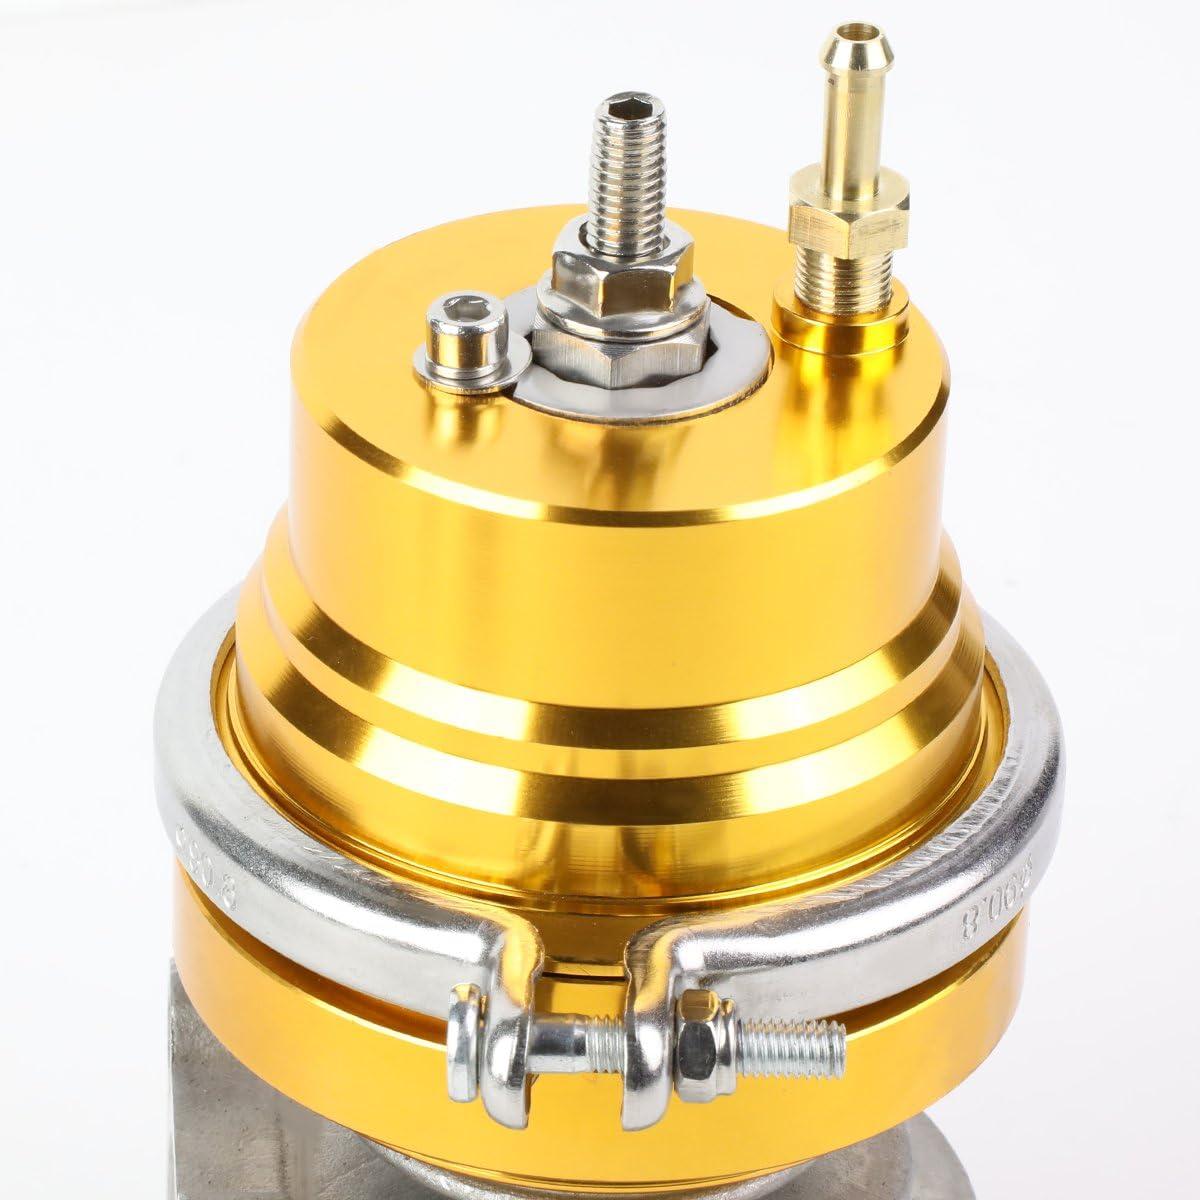 DNA Motoring WG-TS-45MM-T11-BK External Turbo Manifold Wastegate